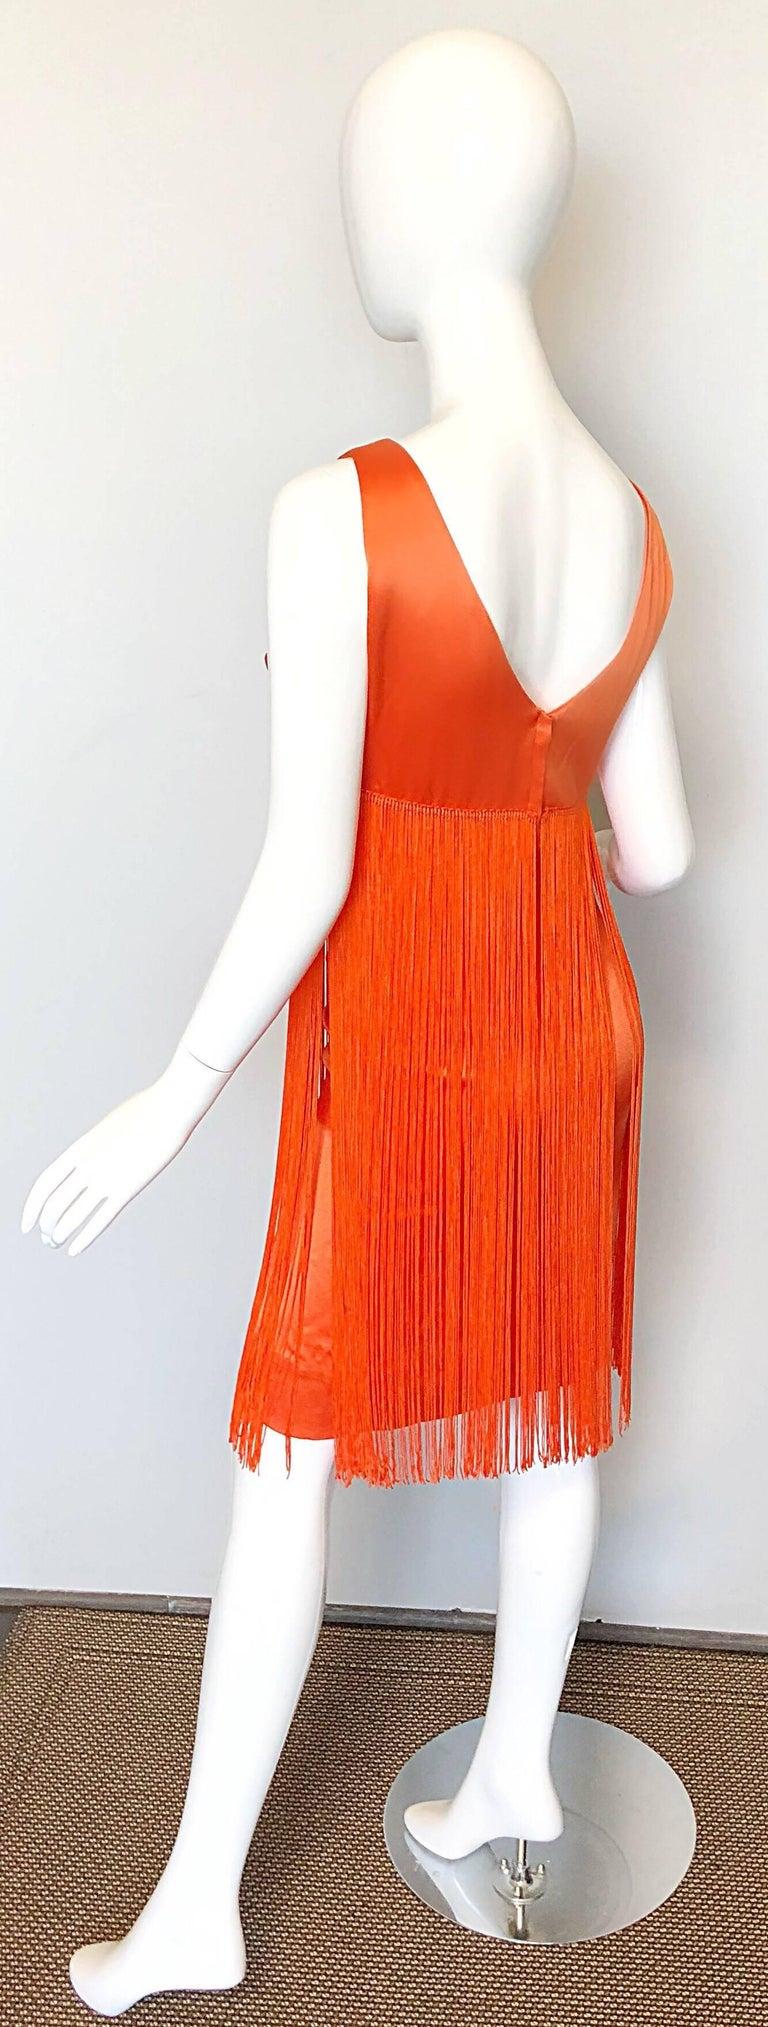 Joseph Magnin 1960s Amazing Bright Orange Fully Fringe Flapper Jersey 60s Dress For Sale 2